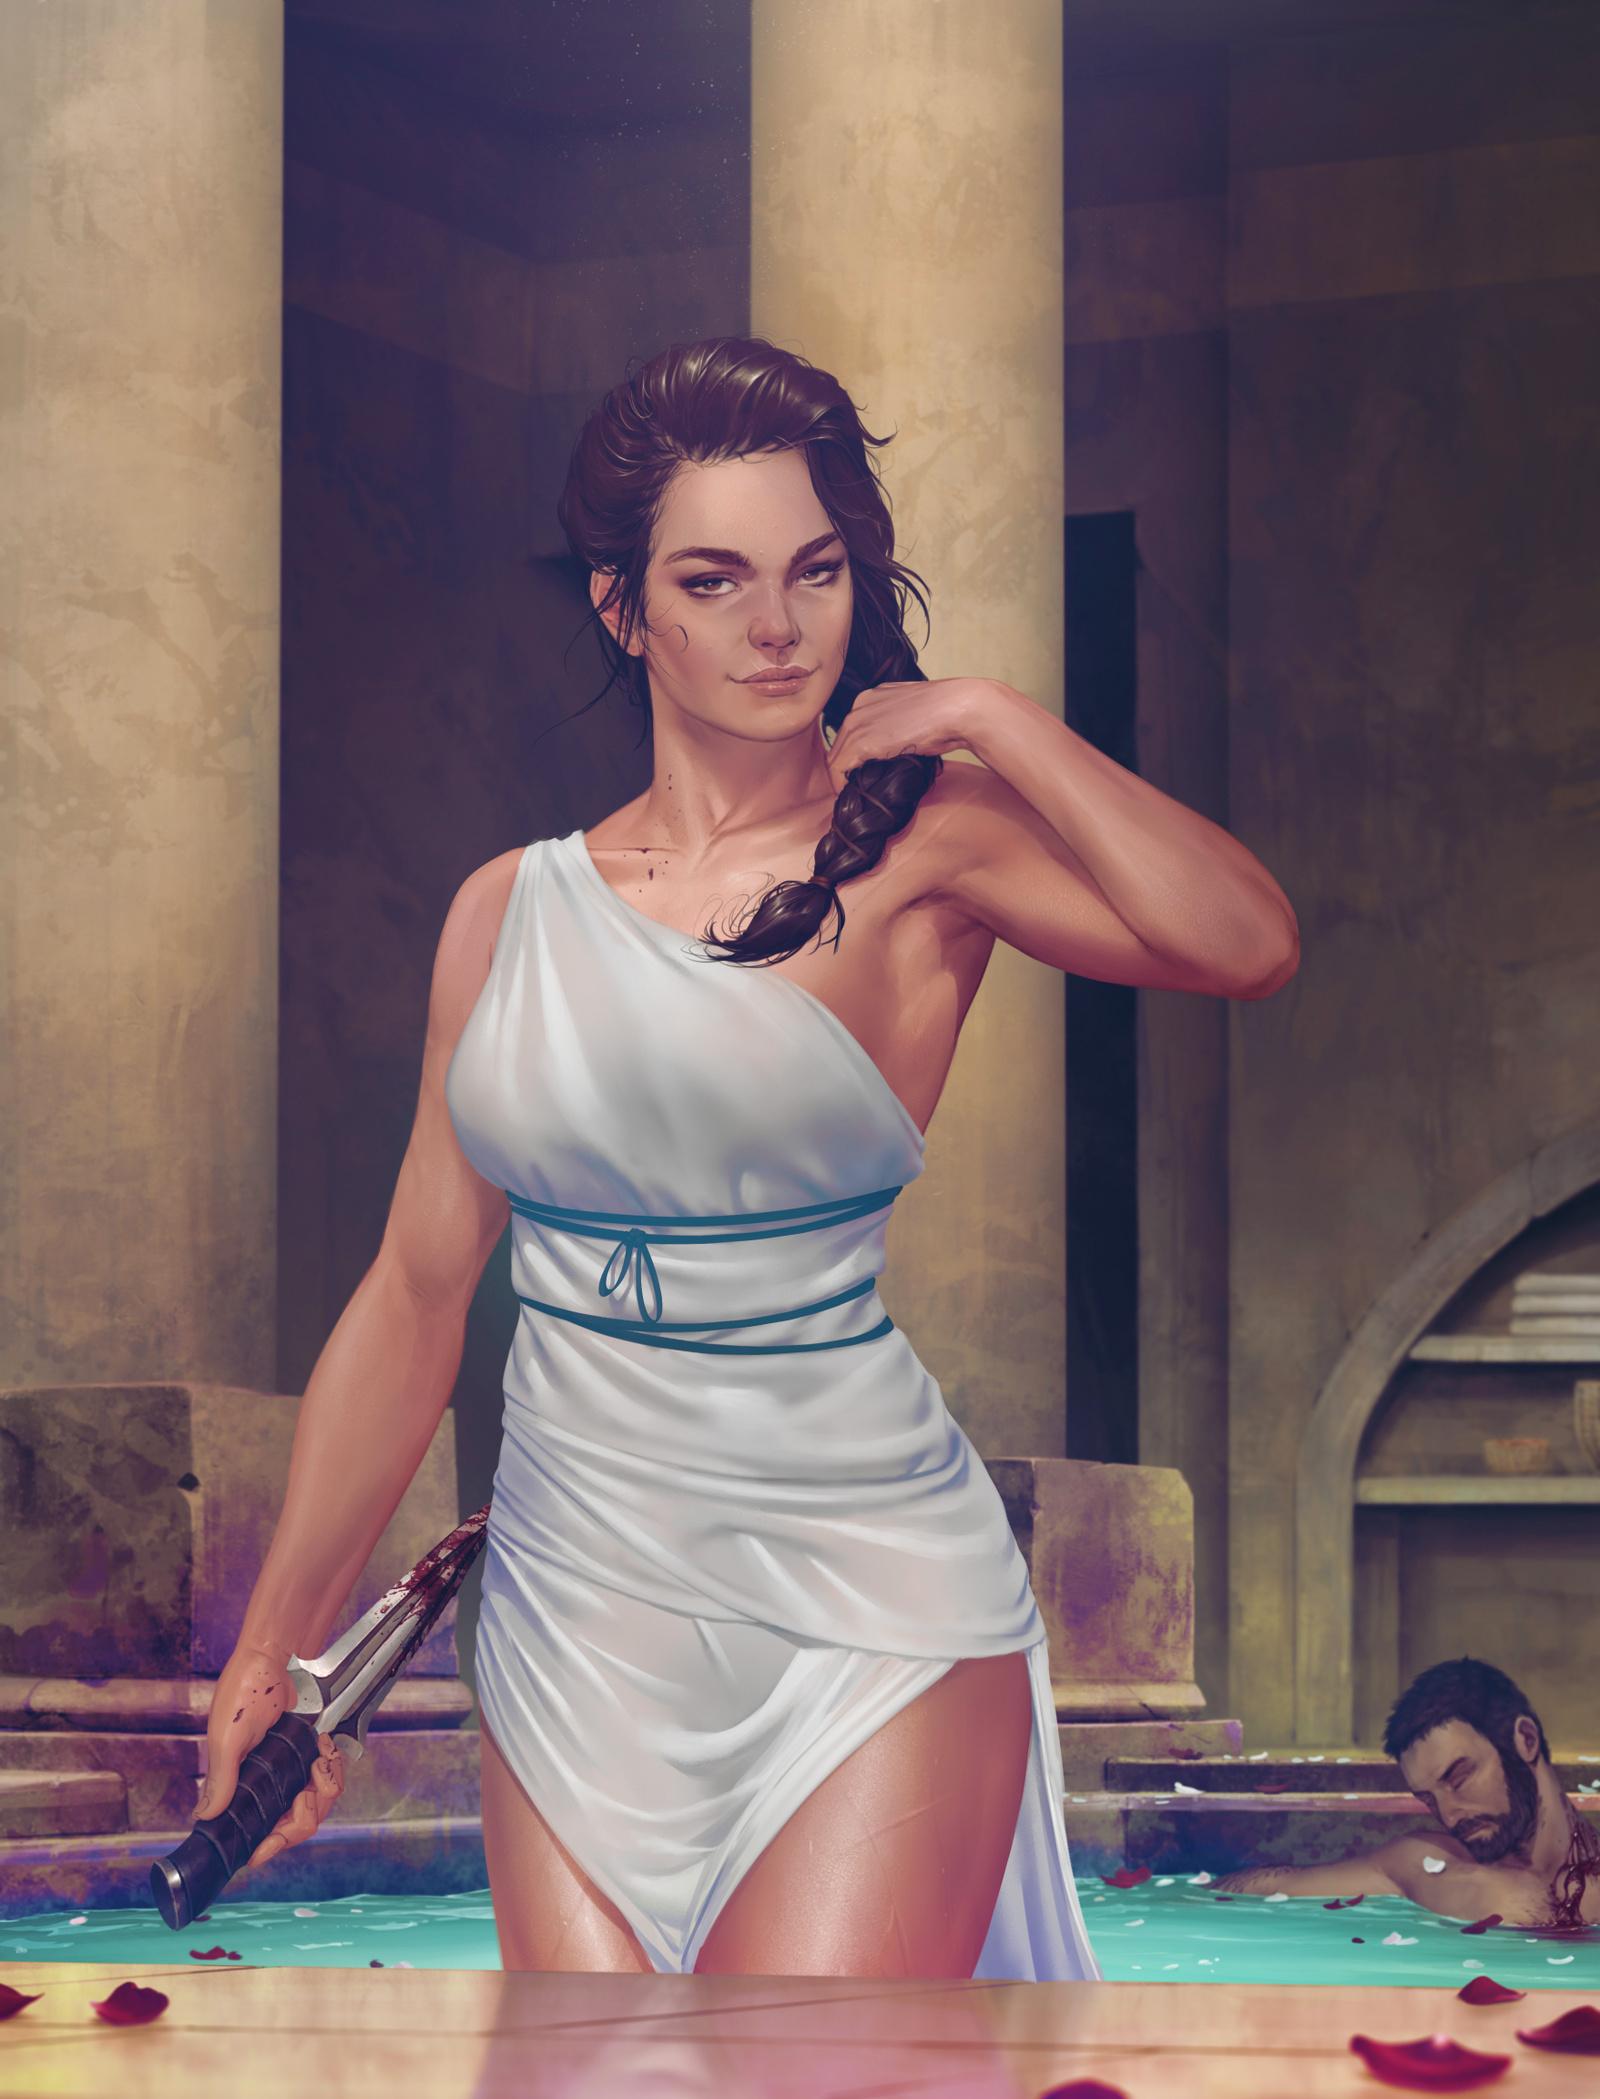 by Krys Decker - Assassin's Creed: Odyssey Арт